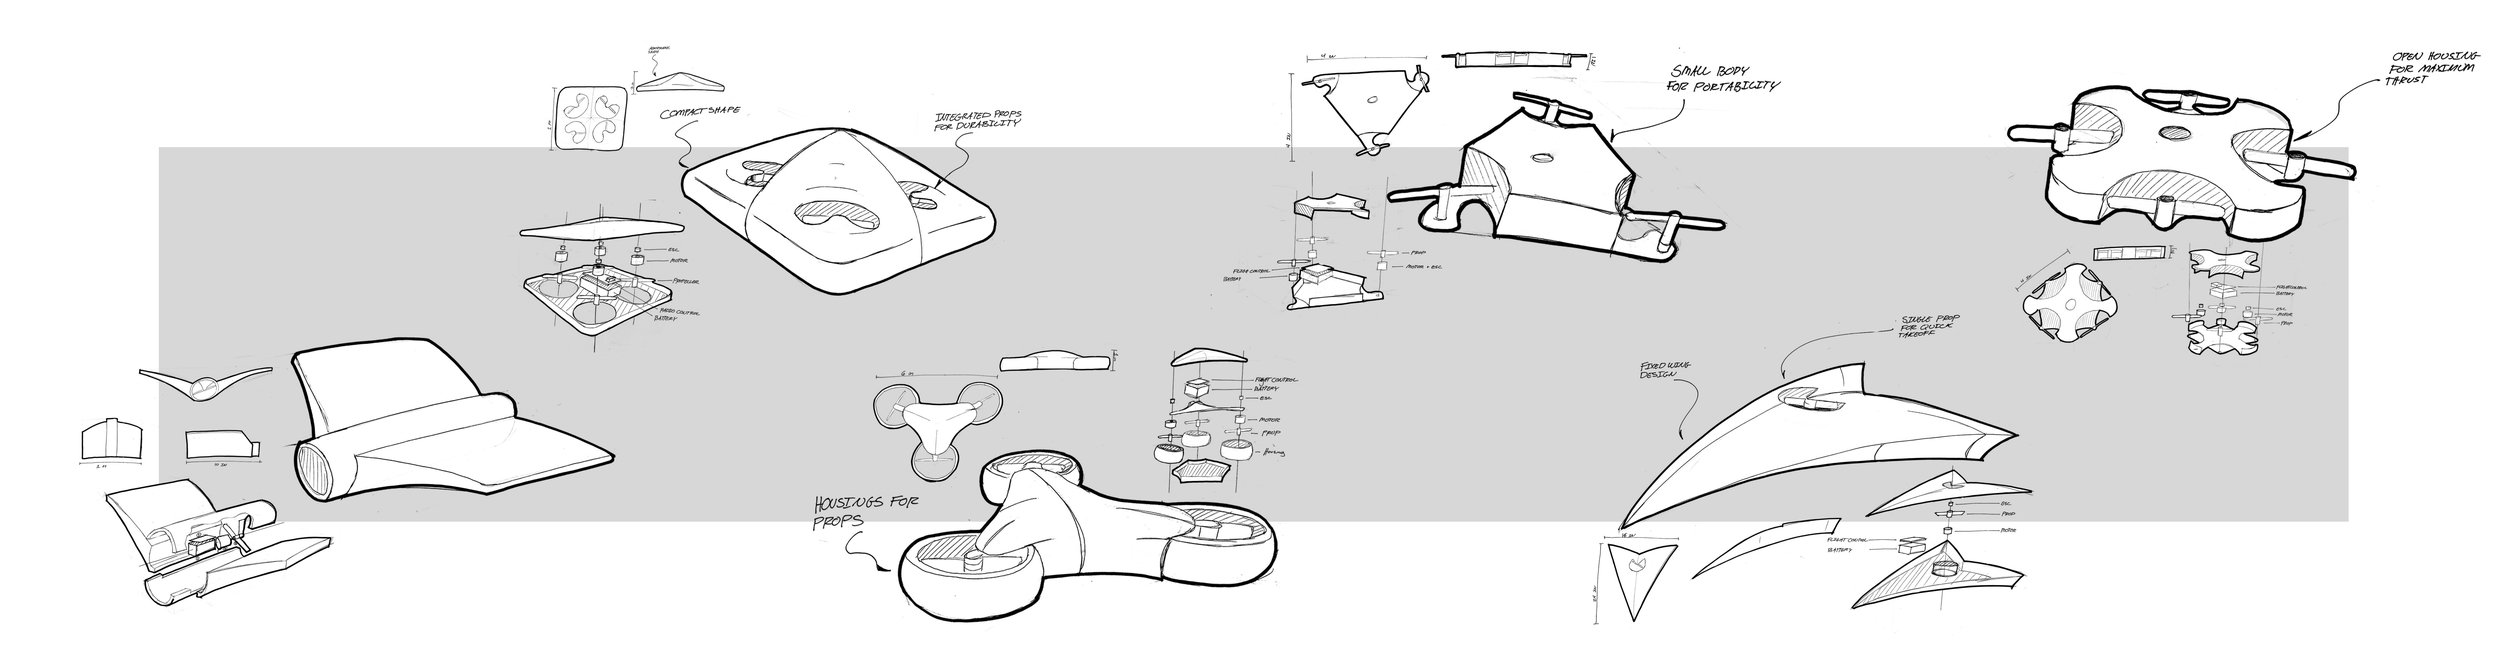 Clidro Sketches.jpg